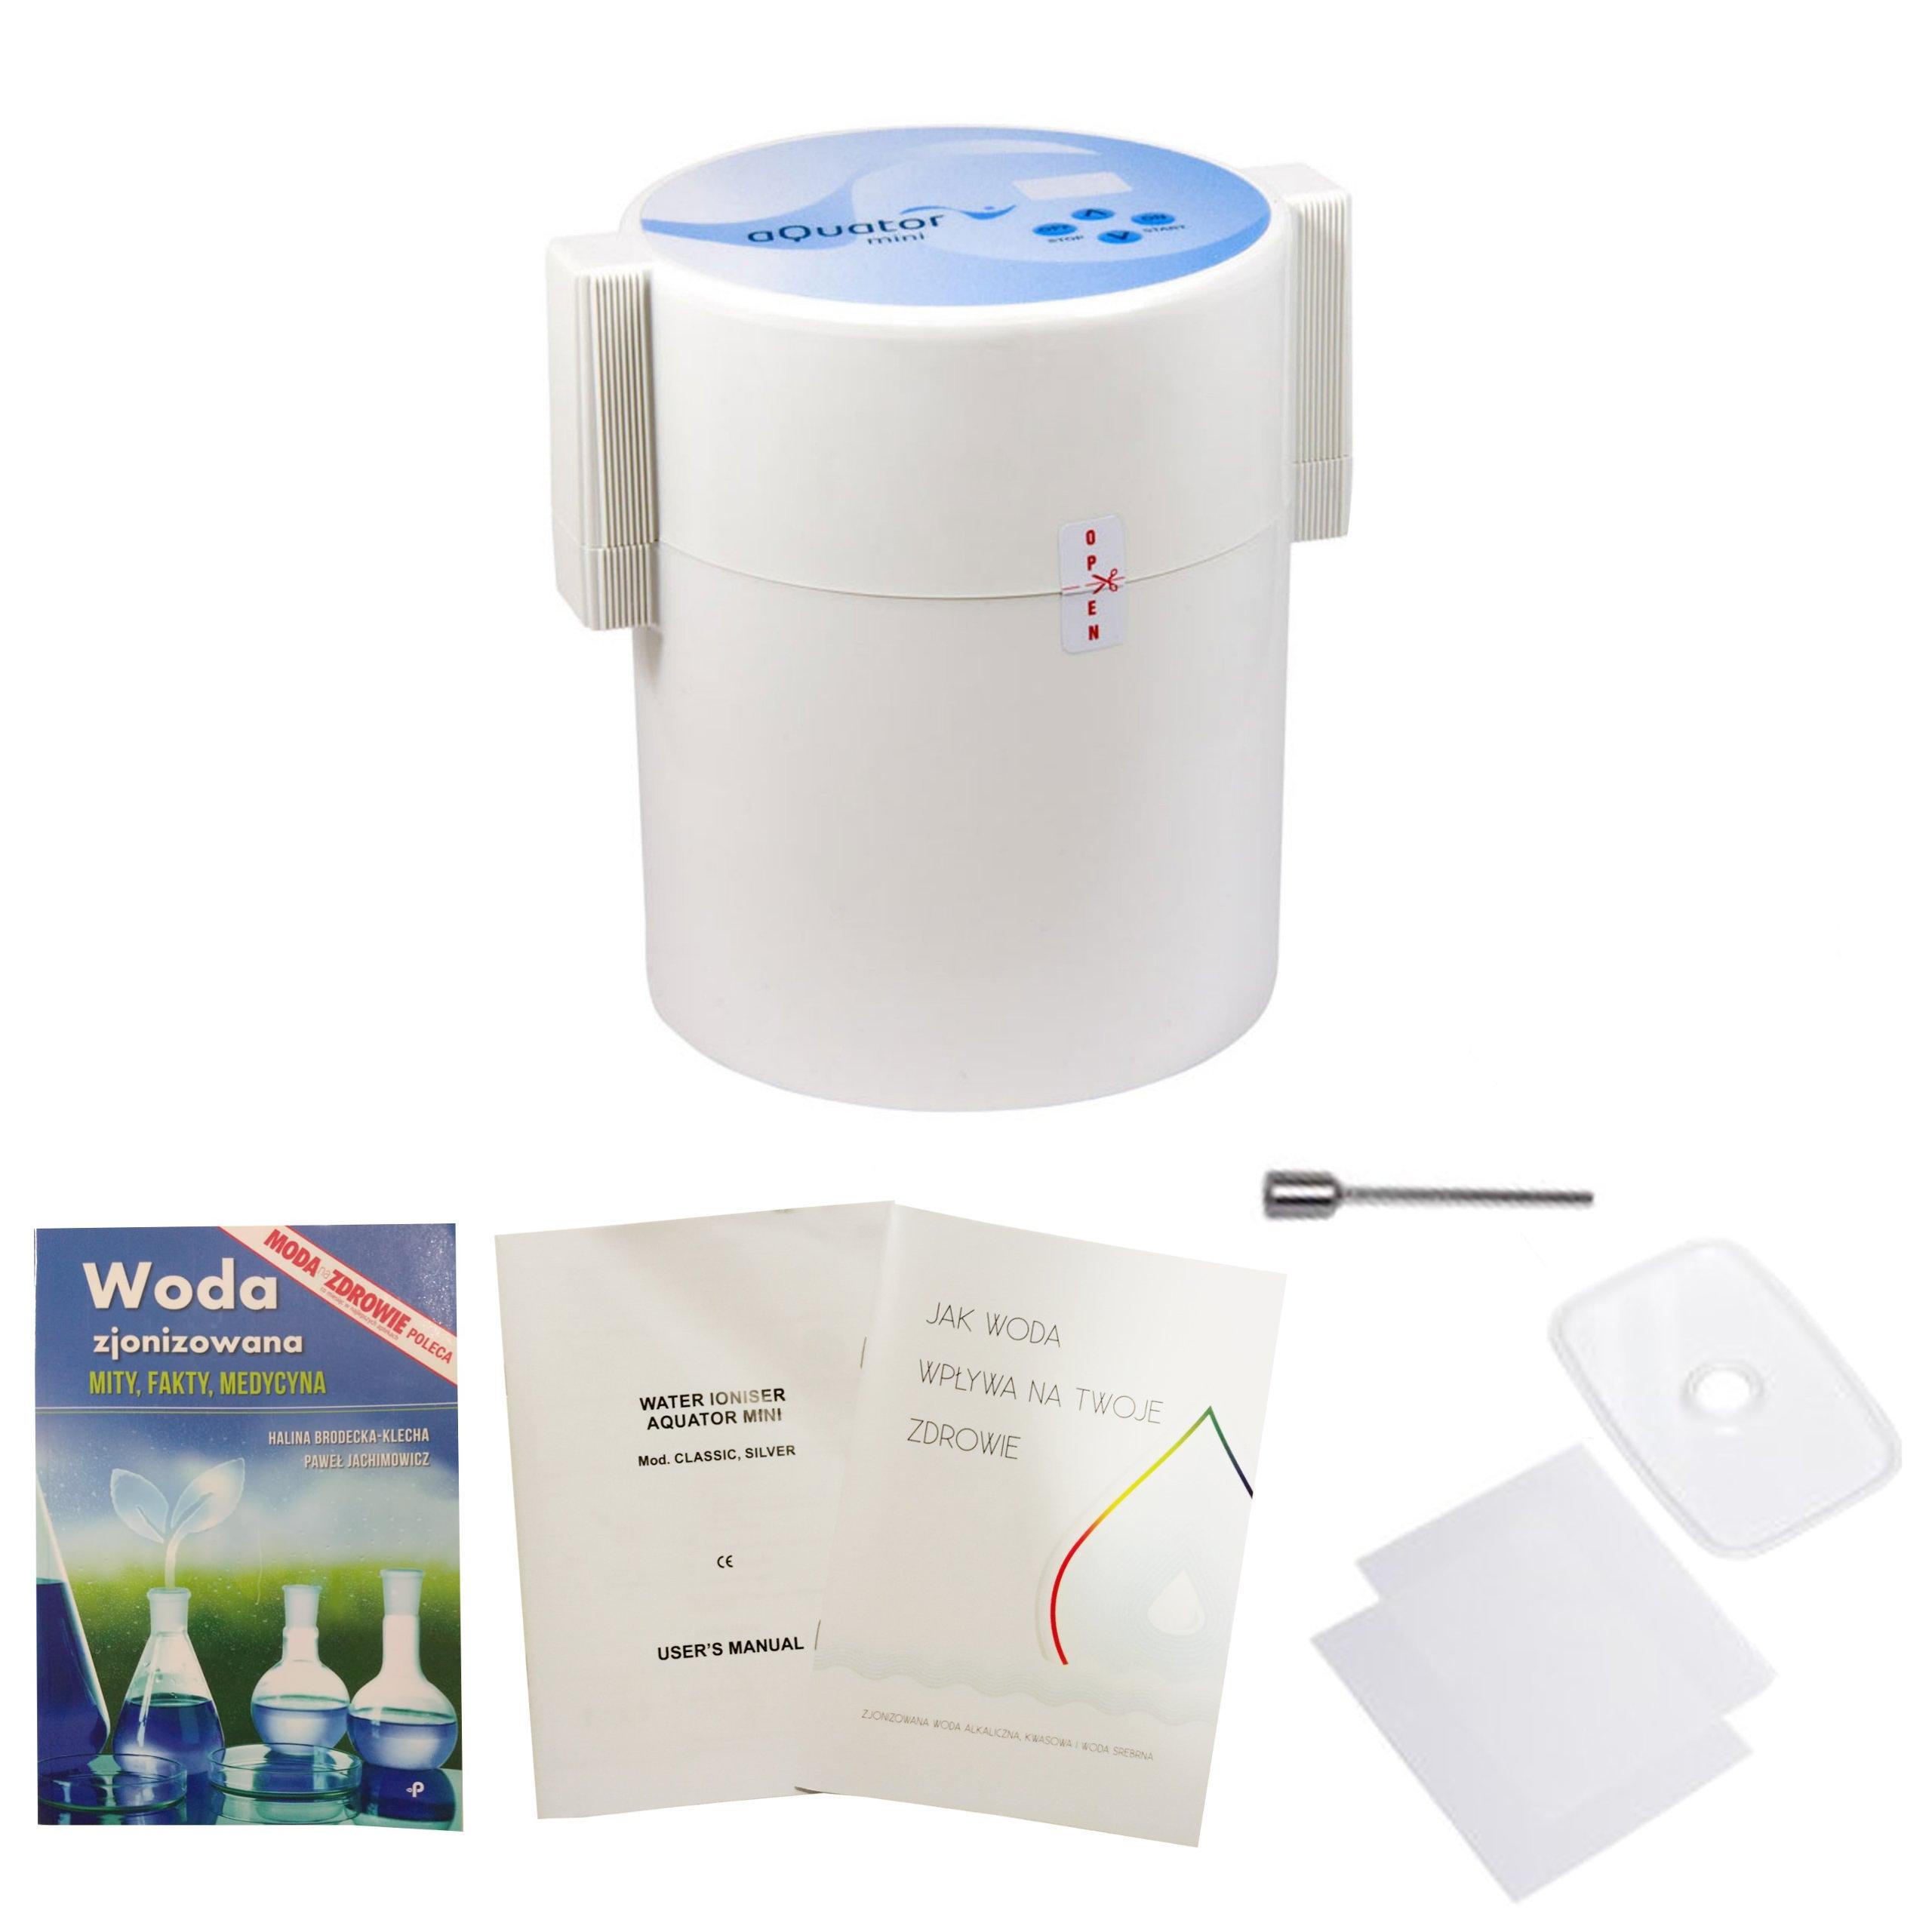 Aquator Mini Silv Ionizer Water Strieborná elektróda